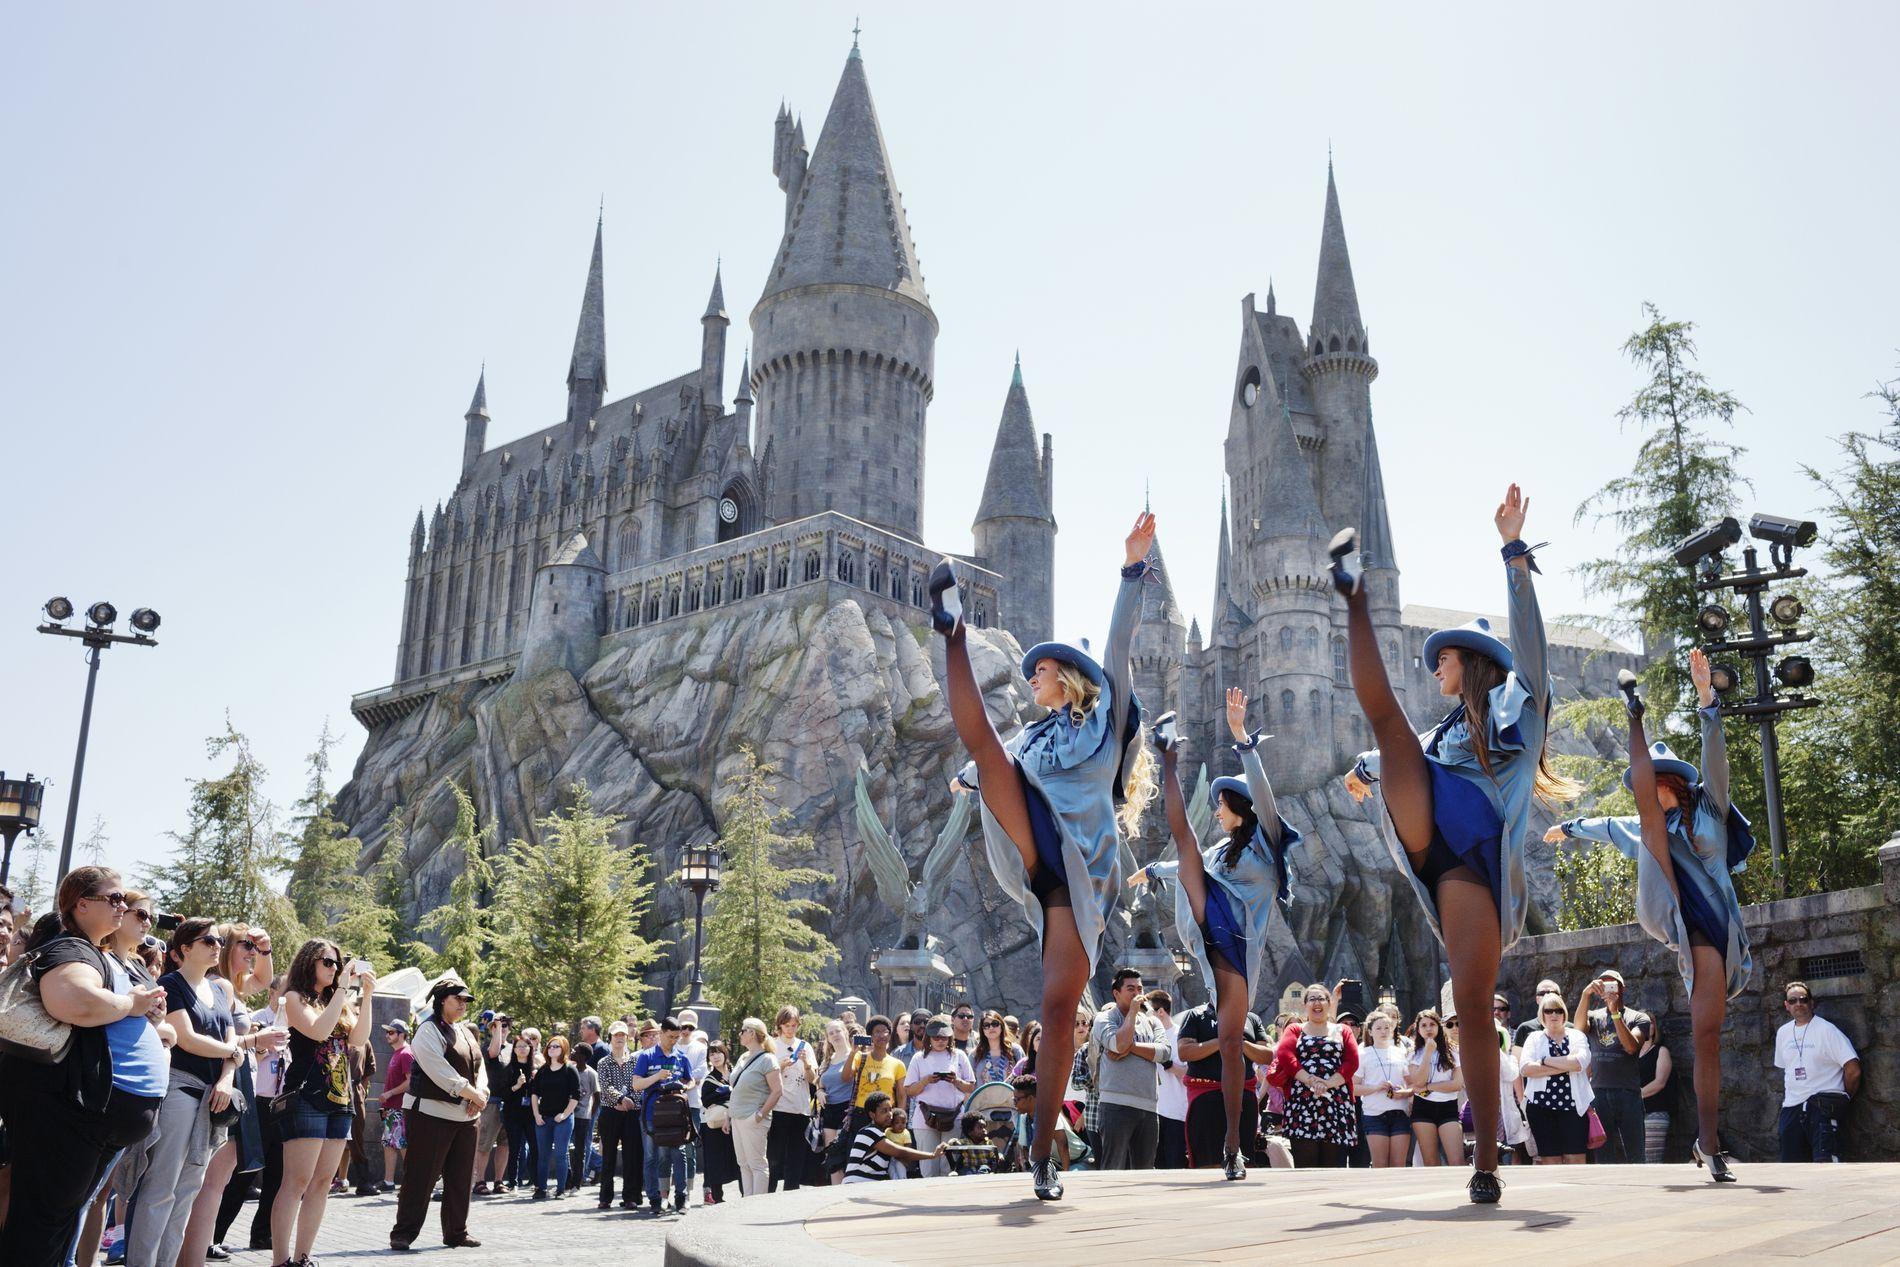 Los Angeles Vg Har Du Noensinne Dromt Om A Fly Pa Kosteskaft Side Om Side Med Harry Potter Gumper I Alle Aldre Far Dr Los Angeles Fornoyelsespark Disneyland